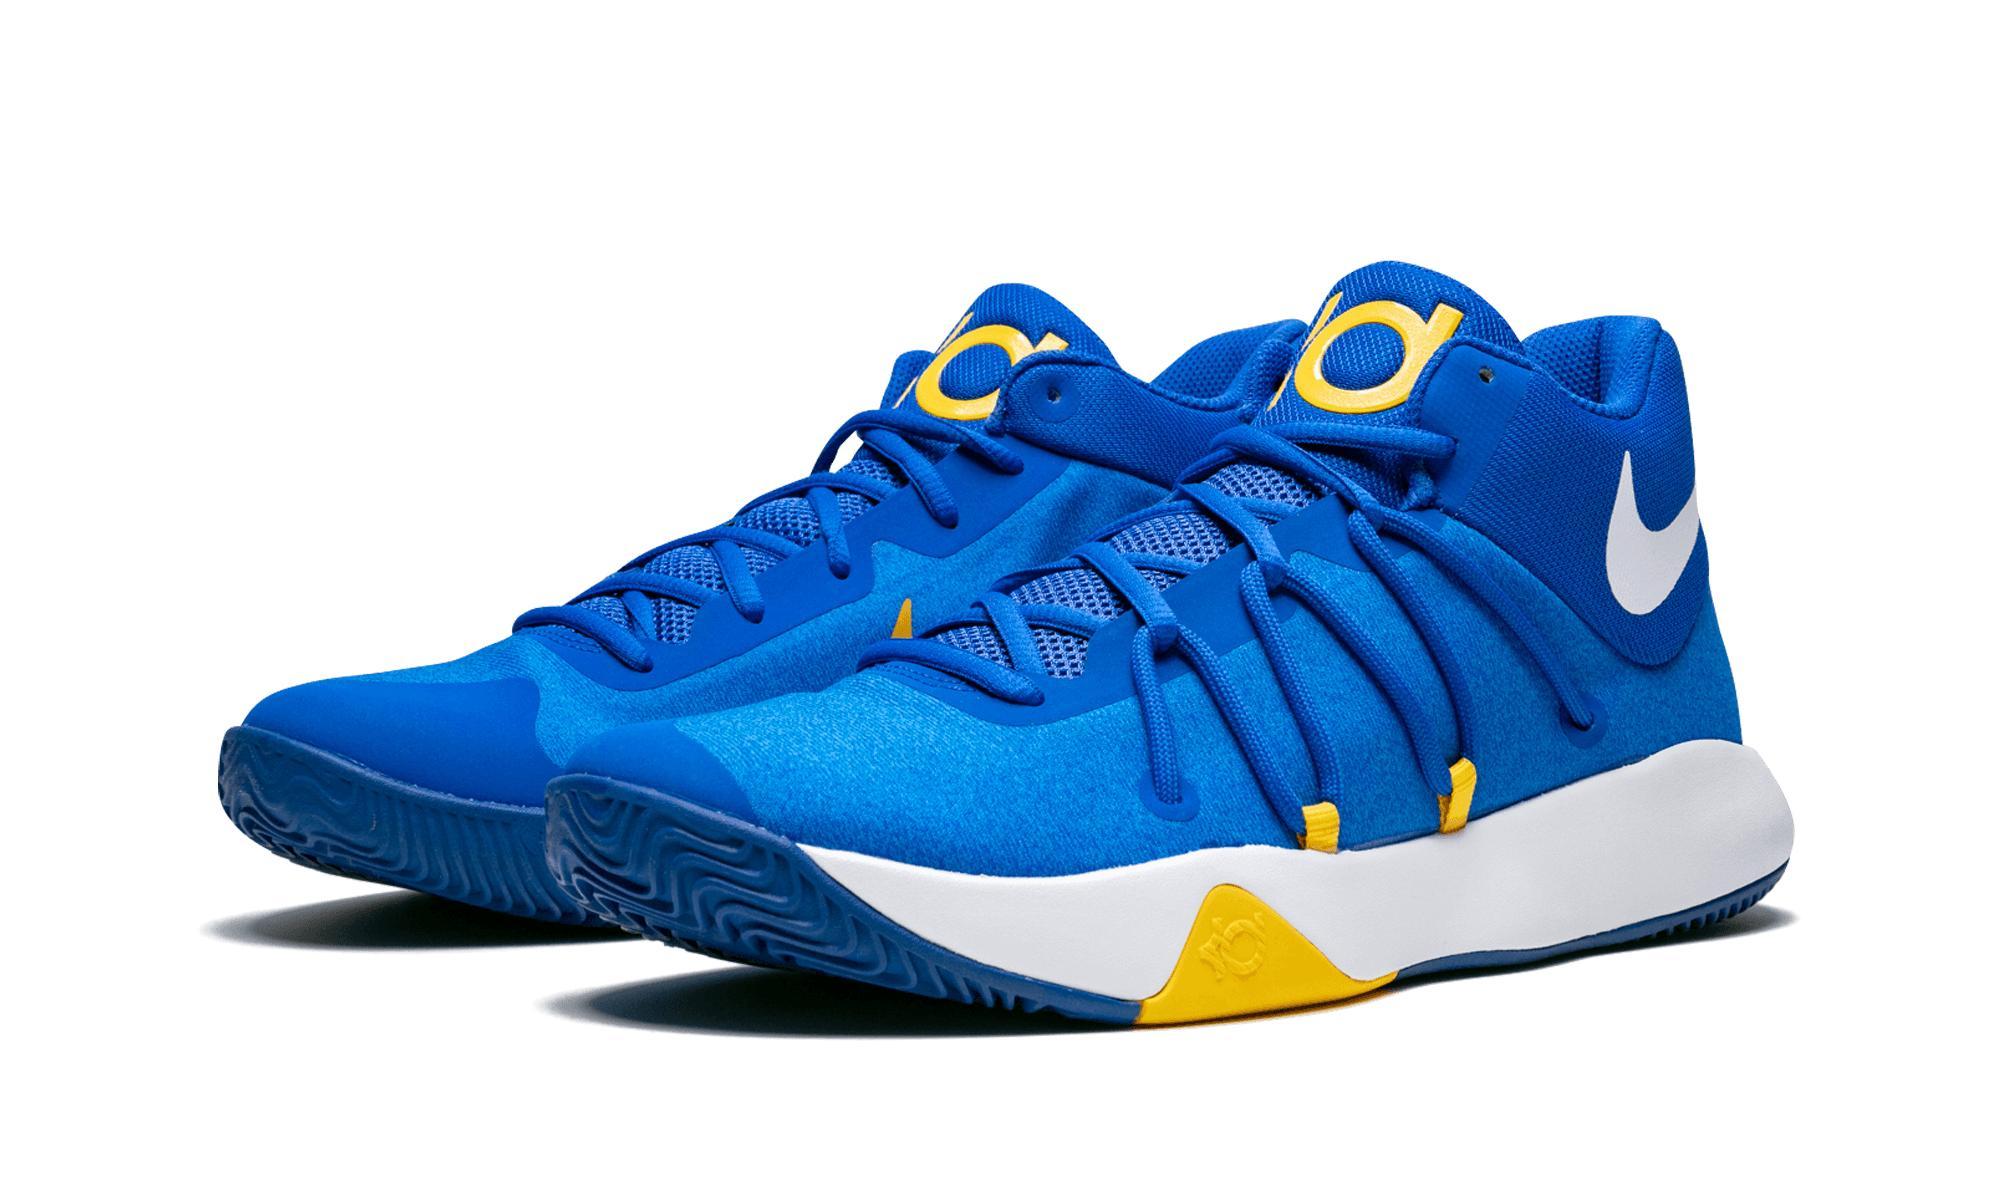 96862cc17c81 Nike - Blue Kd Trey 5 for Men - Lyst. View fullscreen